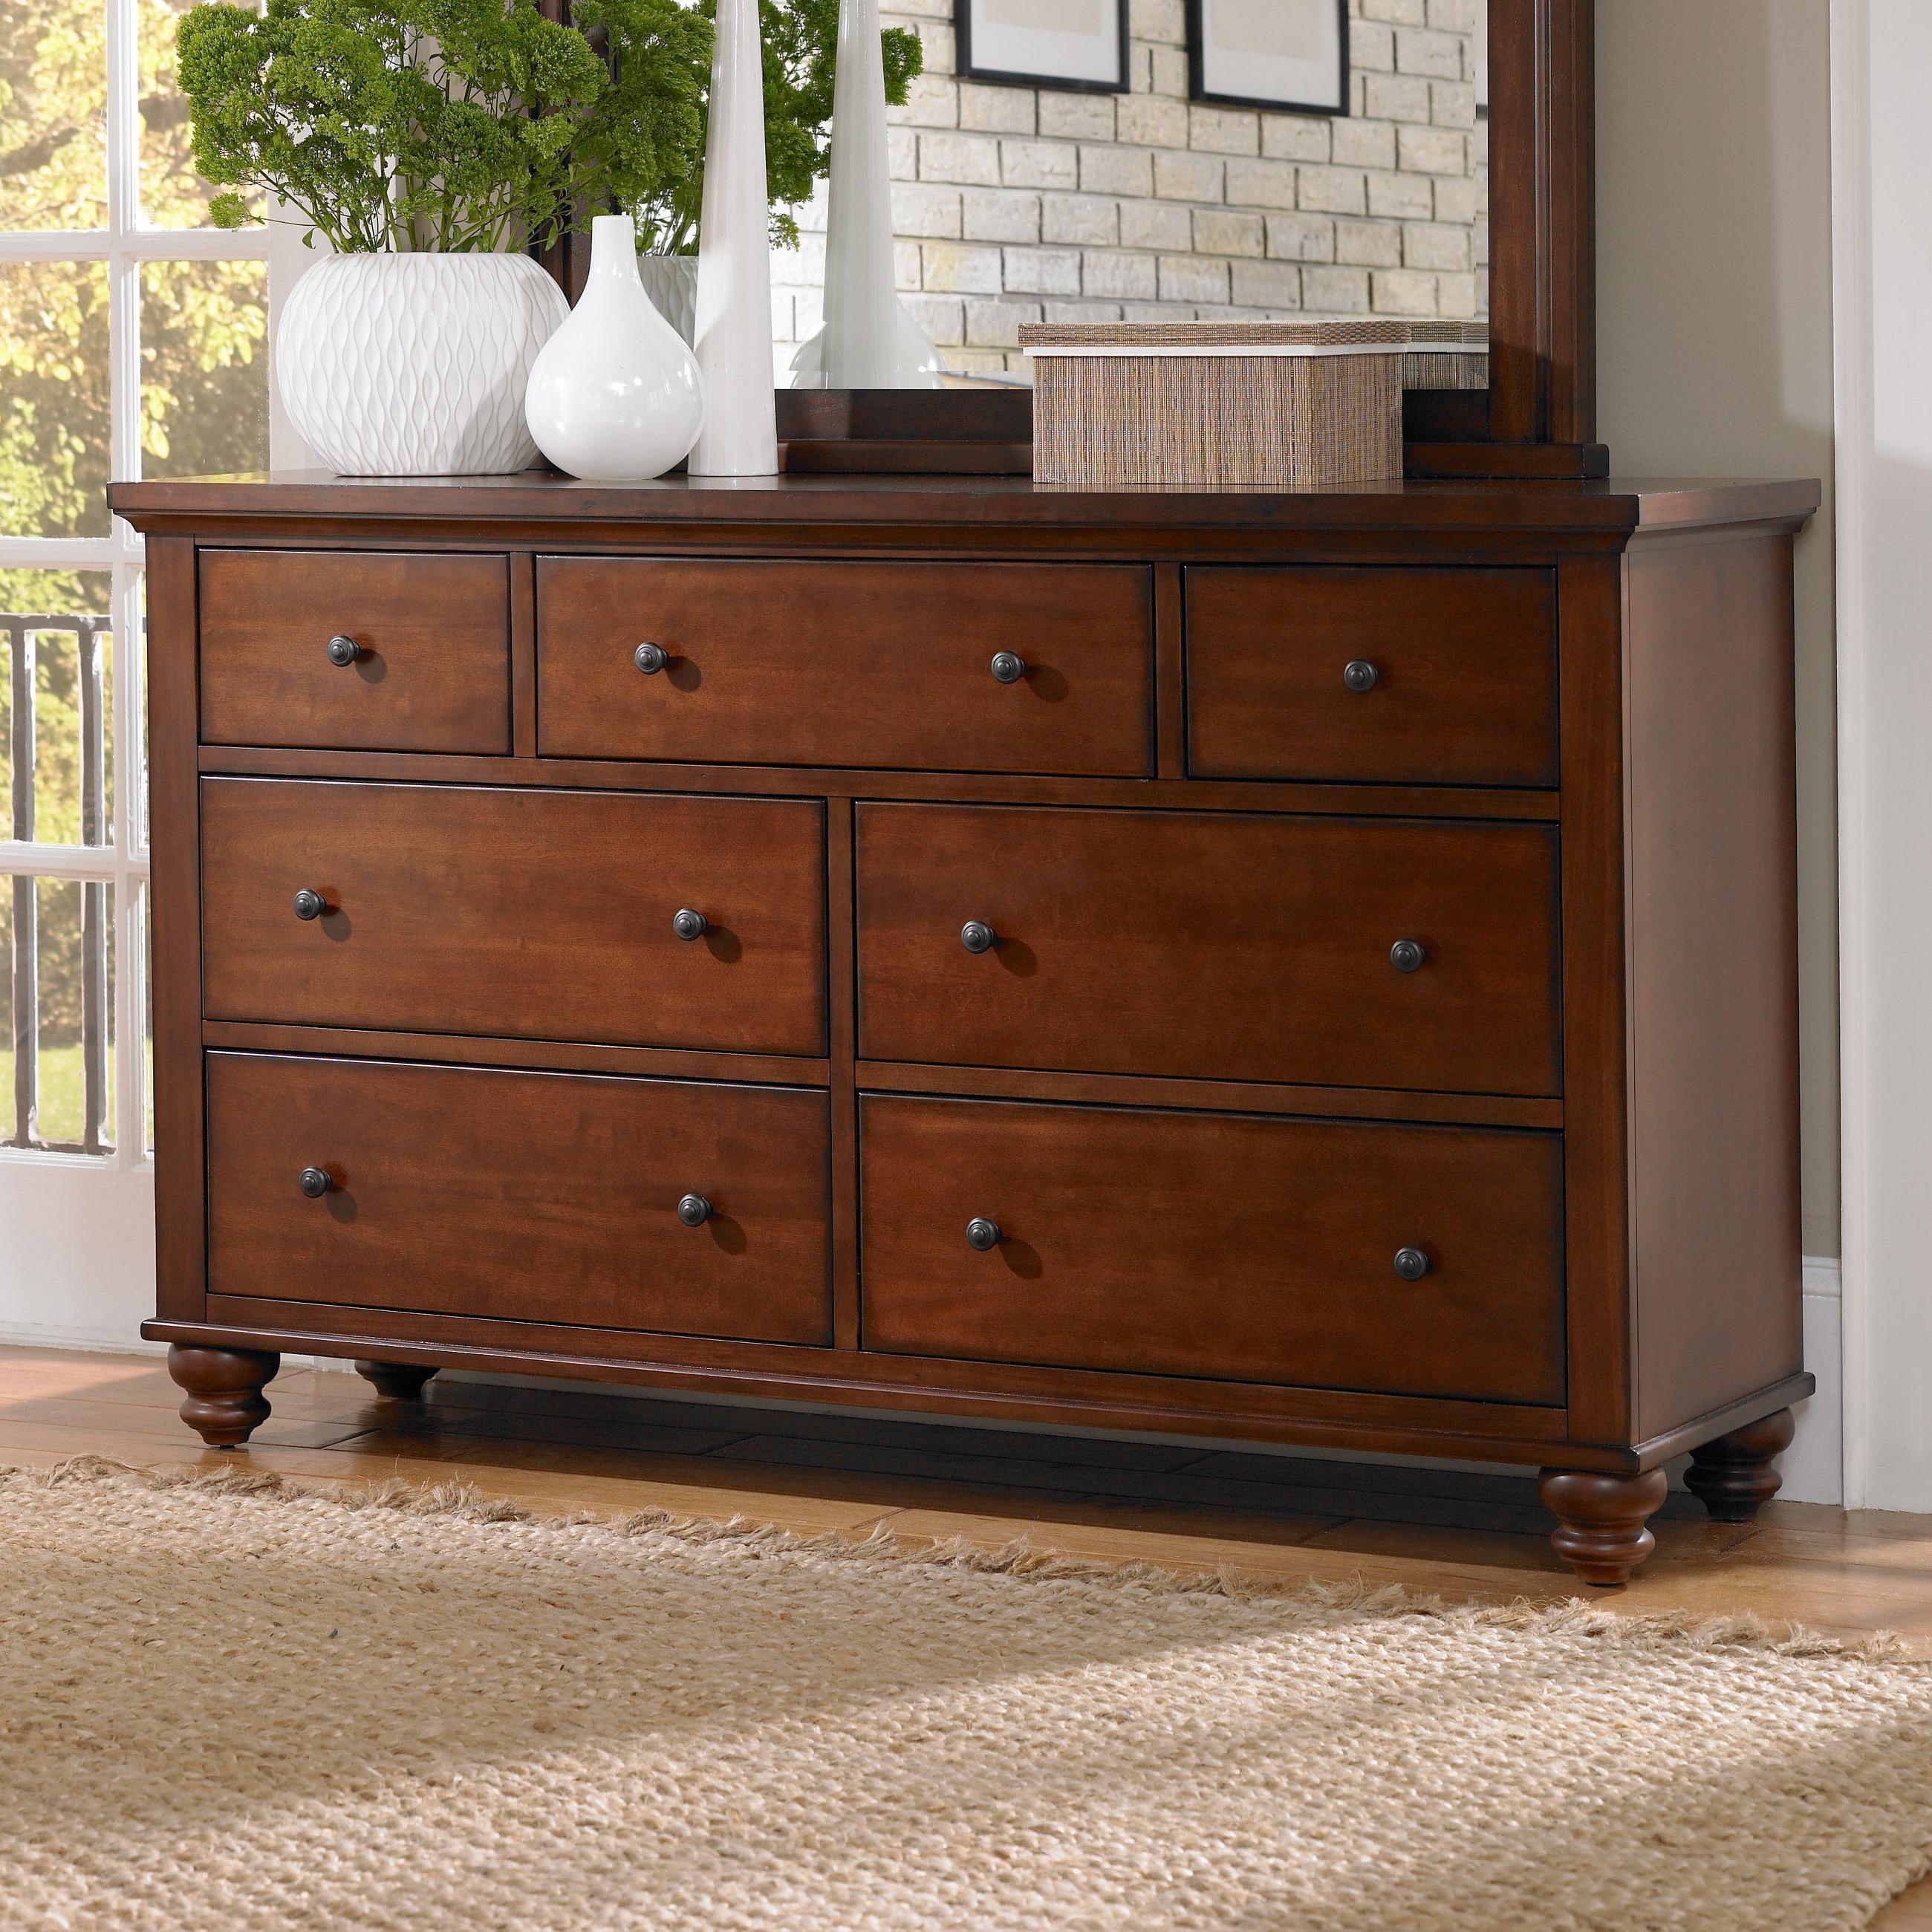 Home Bedroom Furniture Dressers Aspenhome Cambridge Double Dresser.  Aspenhome CambridgeDouble Dresser; Aspenhome CambridgeDouble Dresser